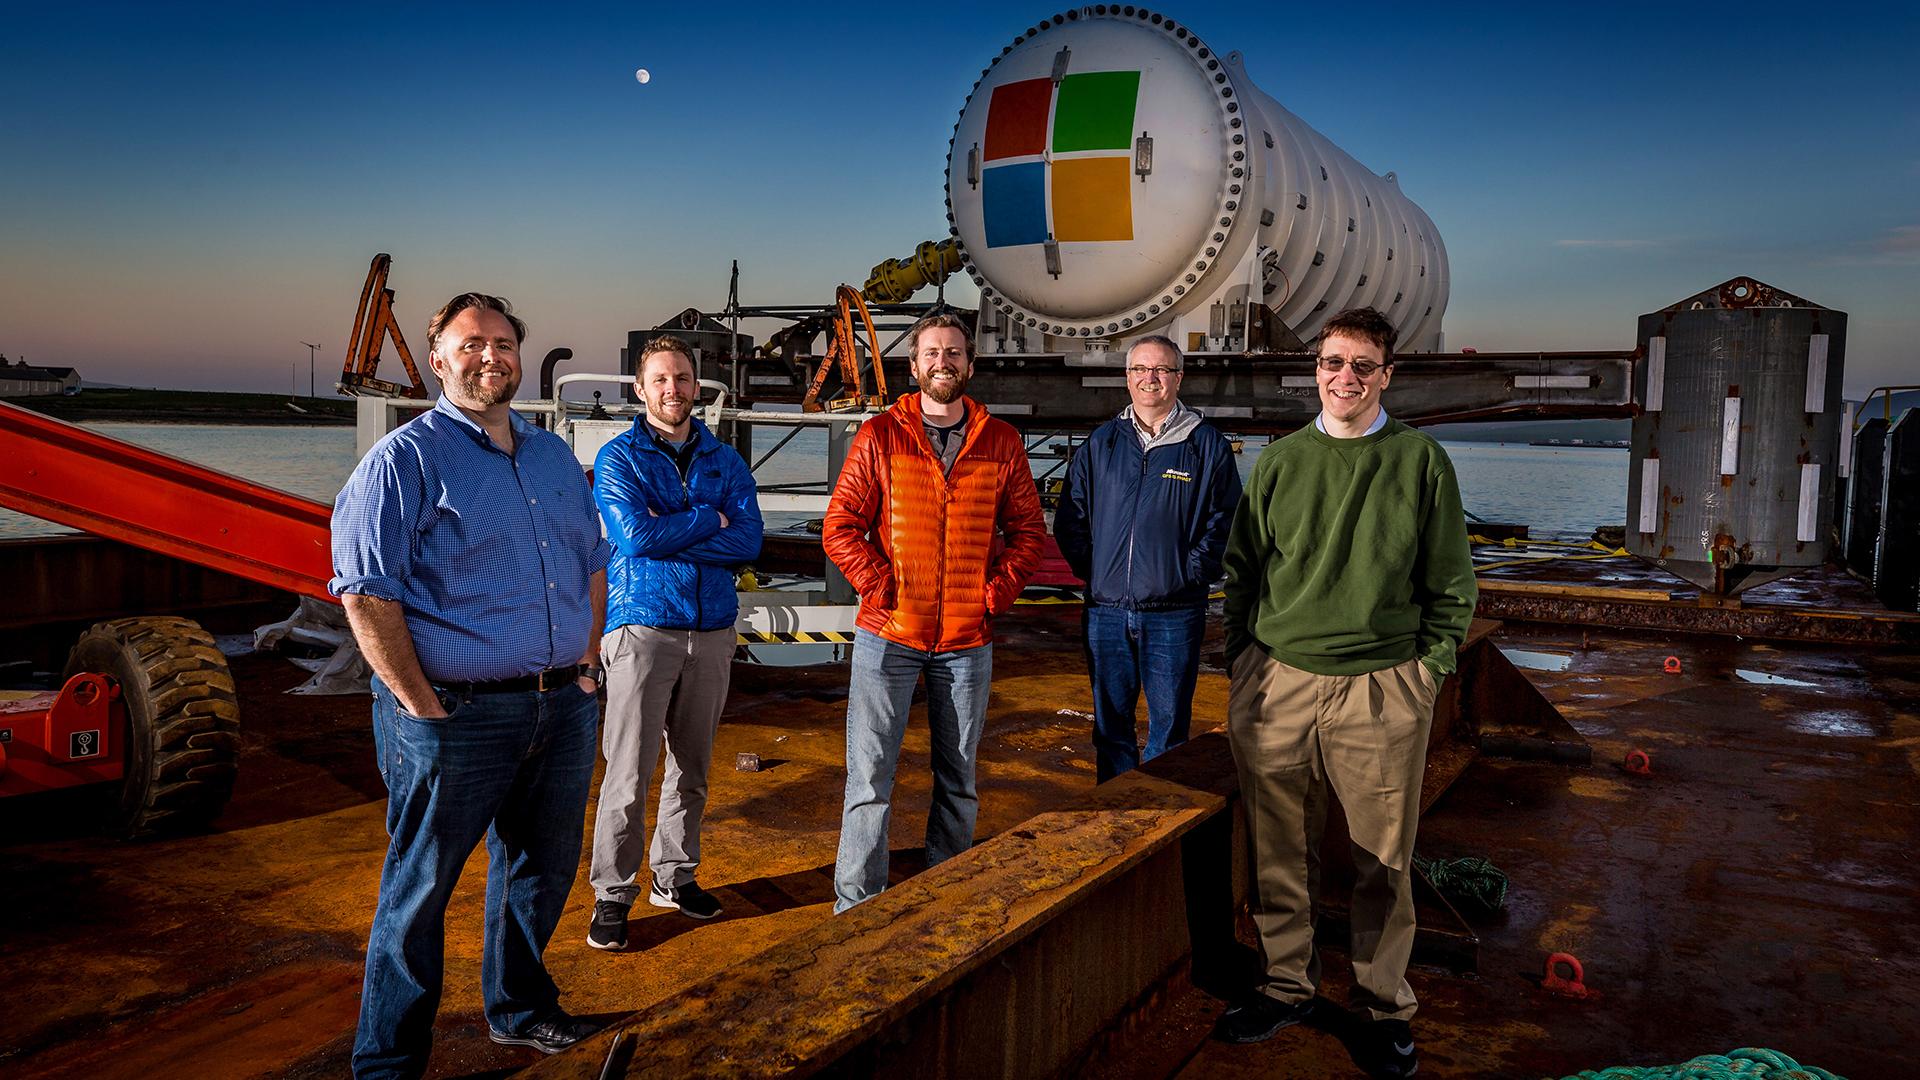 Microsoft's Project Natick TEAM